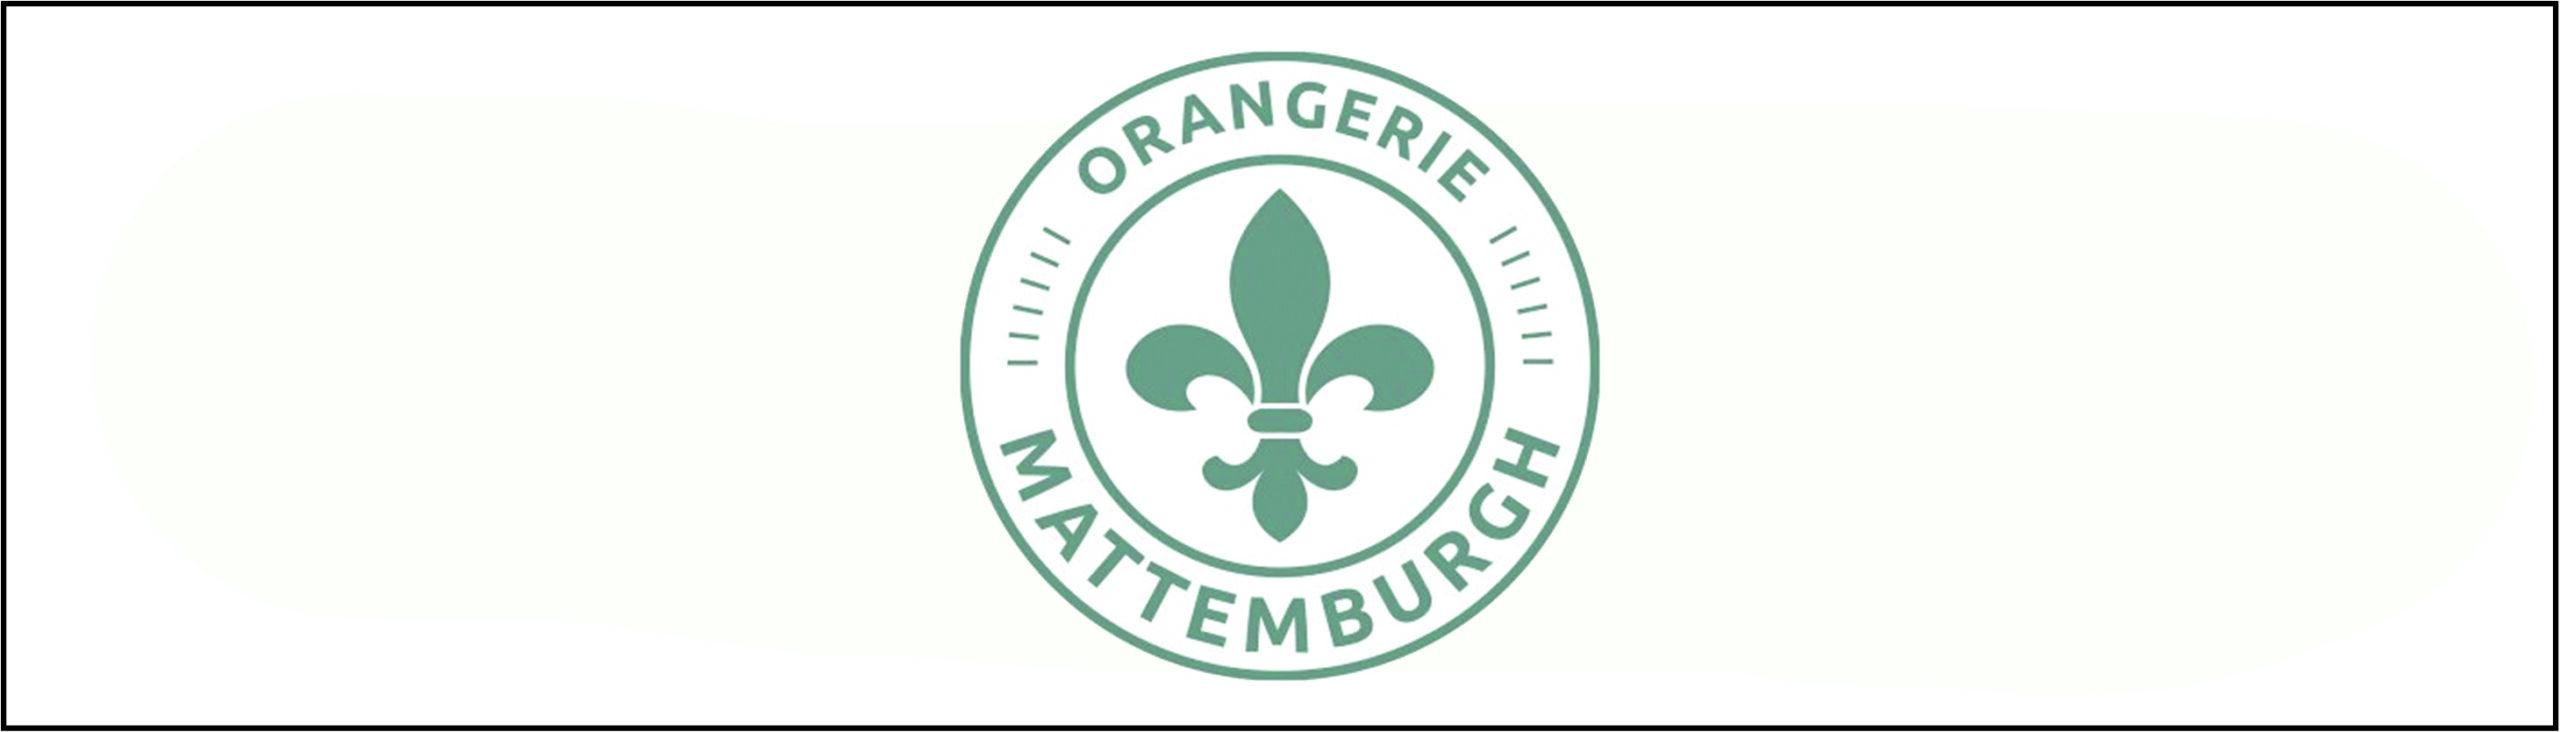 Mattemburgh Bergen op Zoom orangerie PION advies training personeel